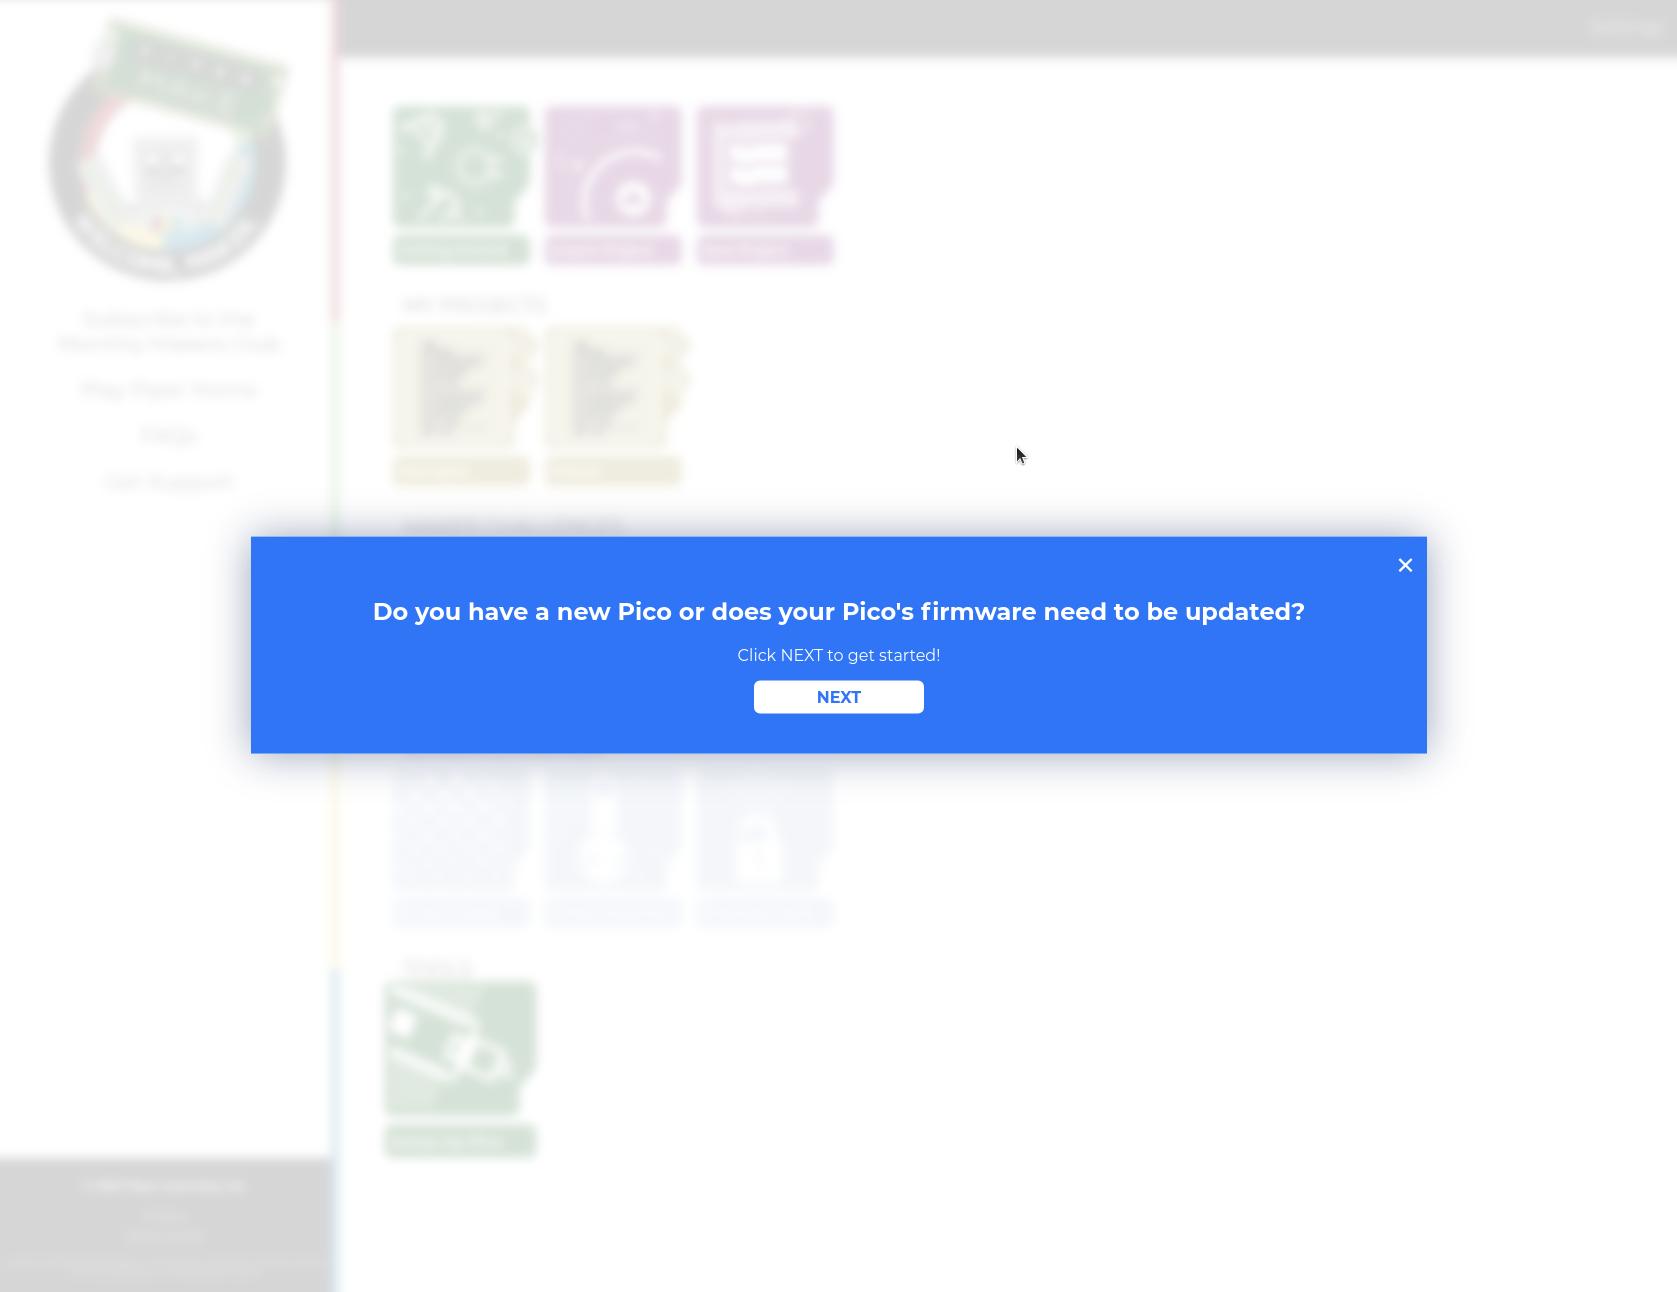 raspberry_pi_Screenshot_from_2021-04-16_17-04-20.png